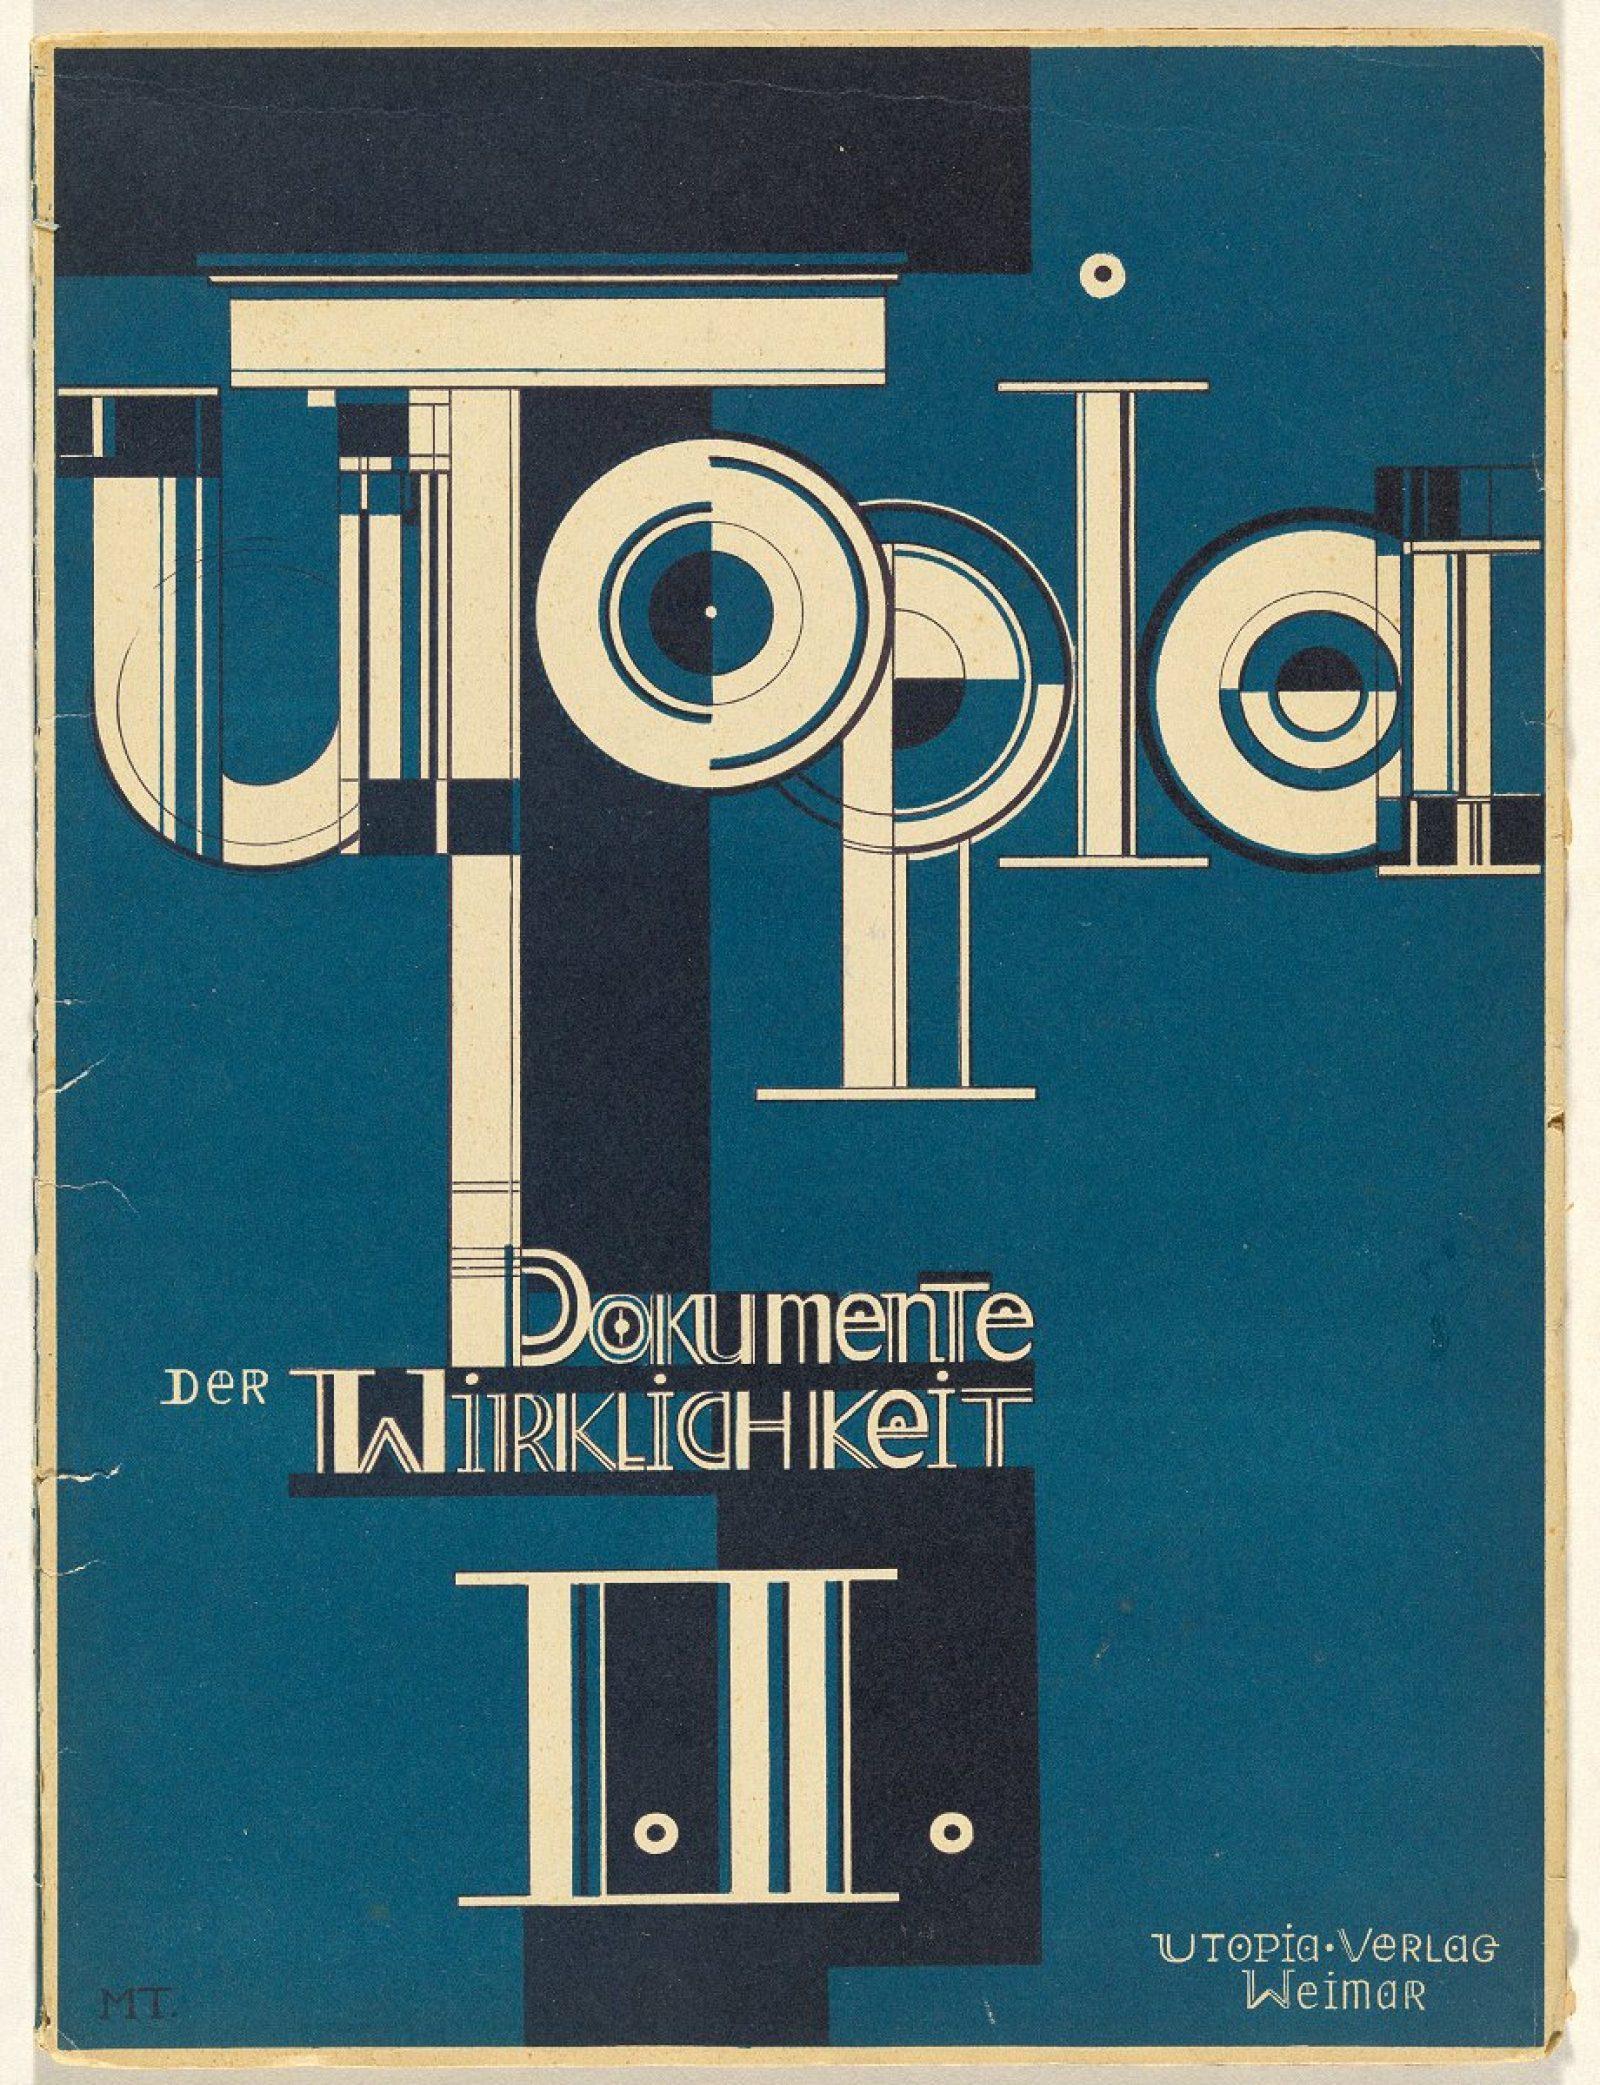 Oskar Schlemmer Utopia: Dokumente der wirklichkeit [Utopia. Documents of reality] 1921